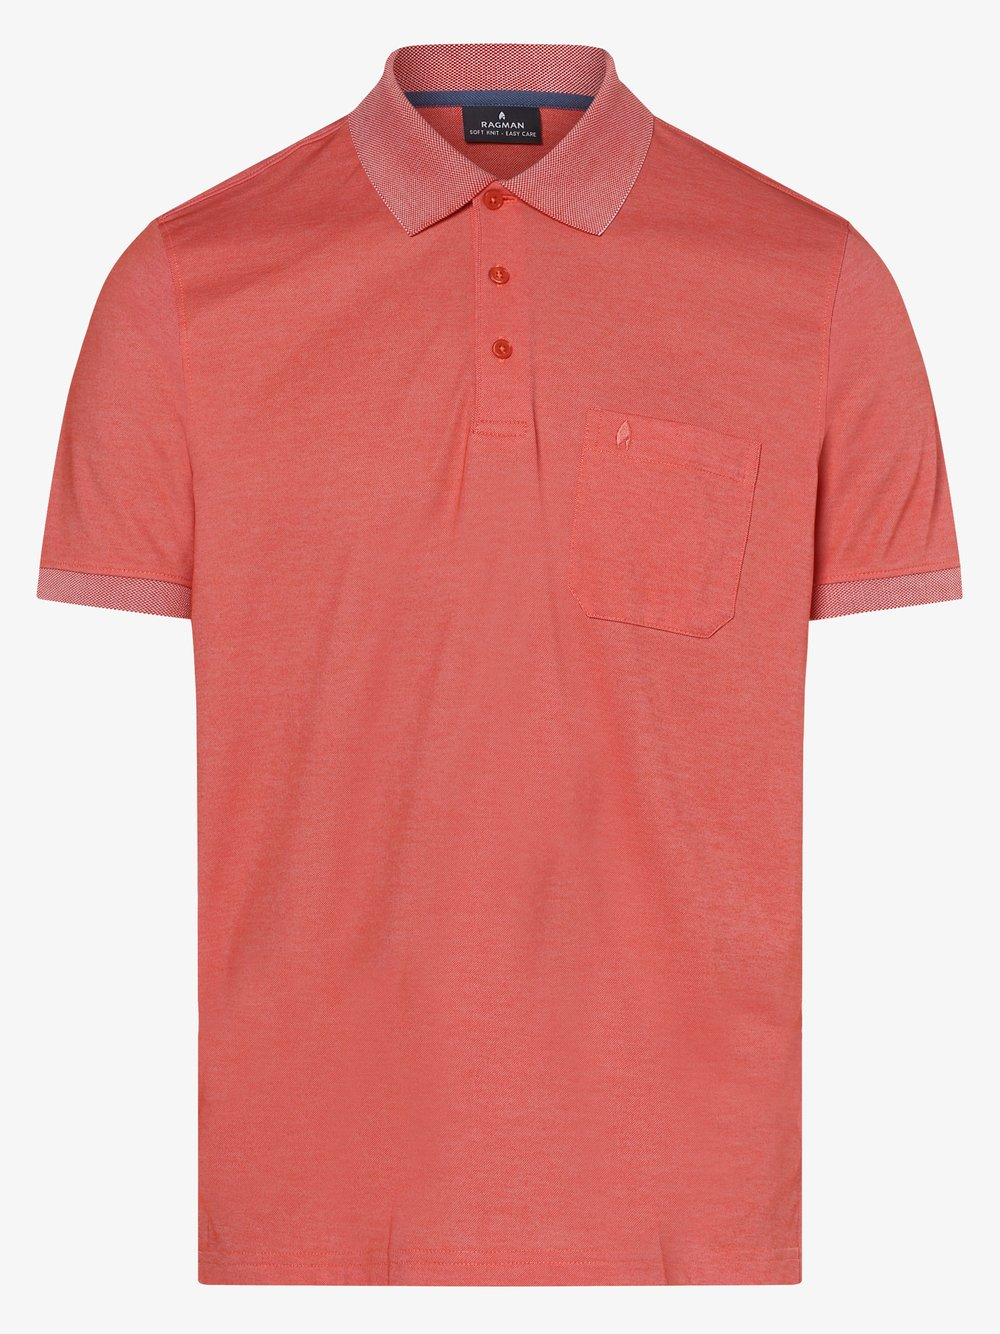 Ragman - Męska koszulka polo, lila